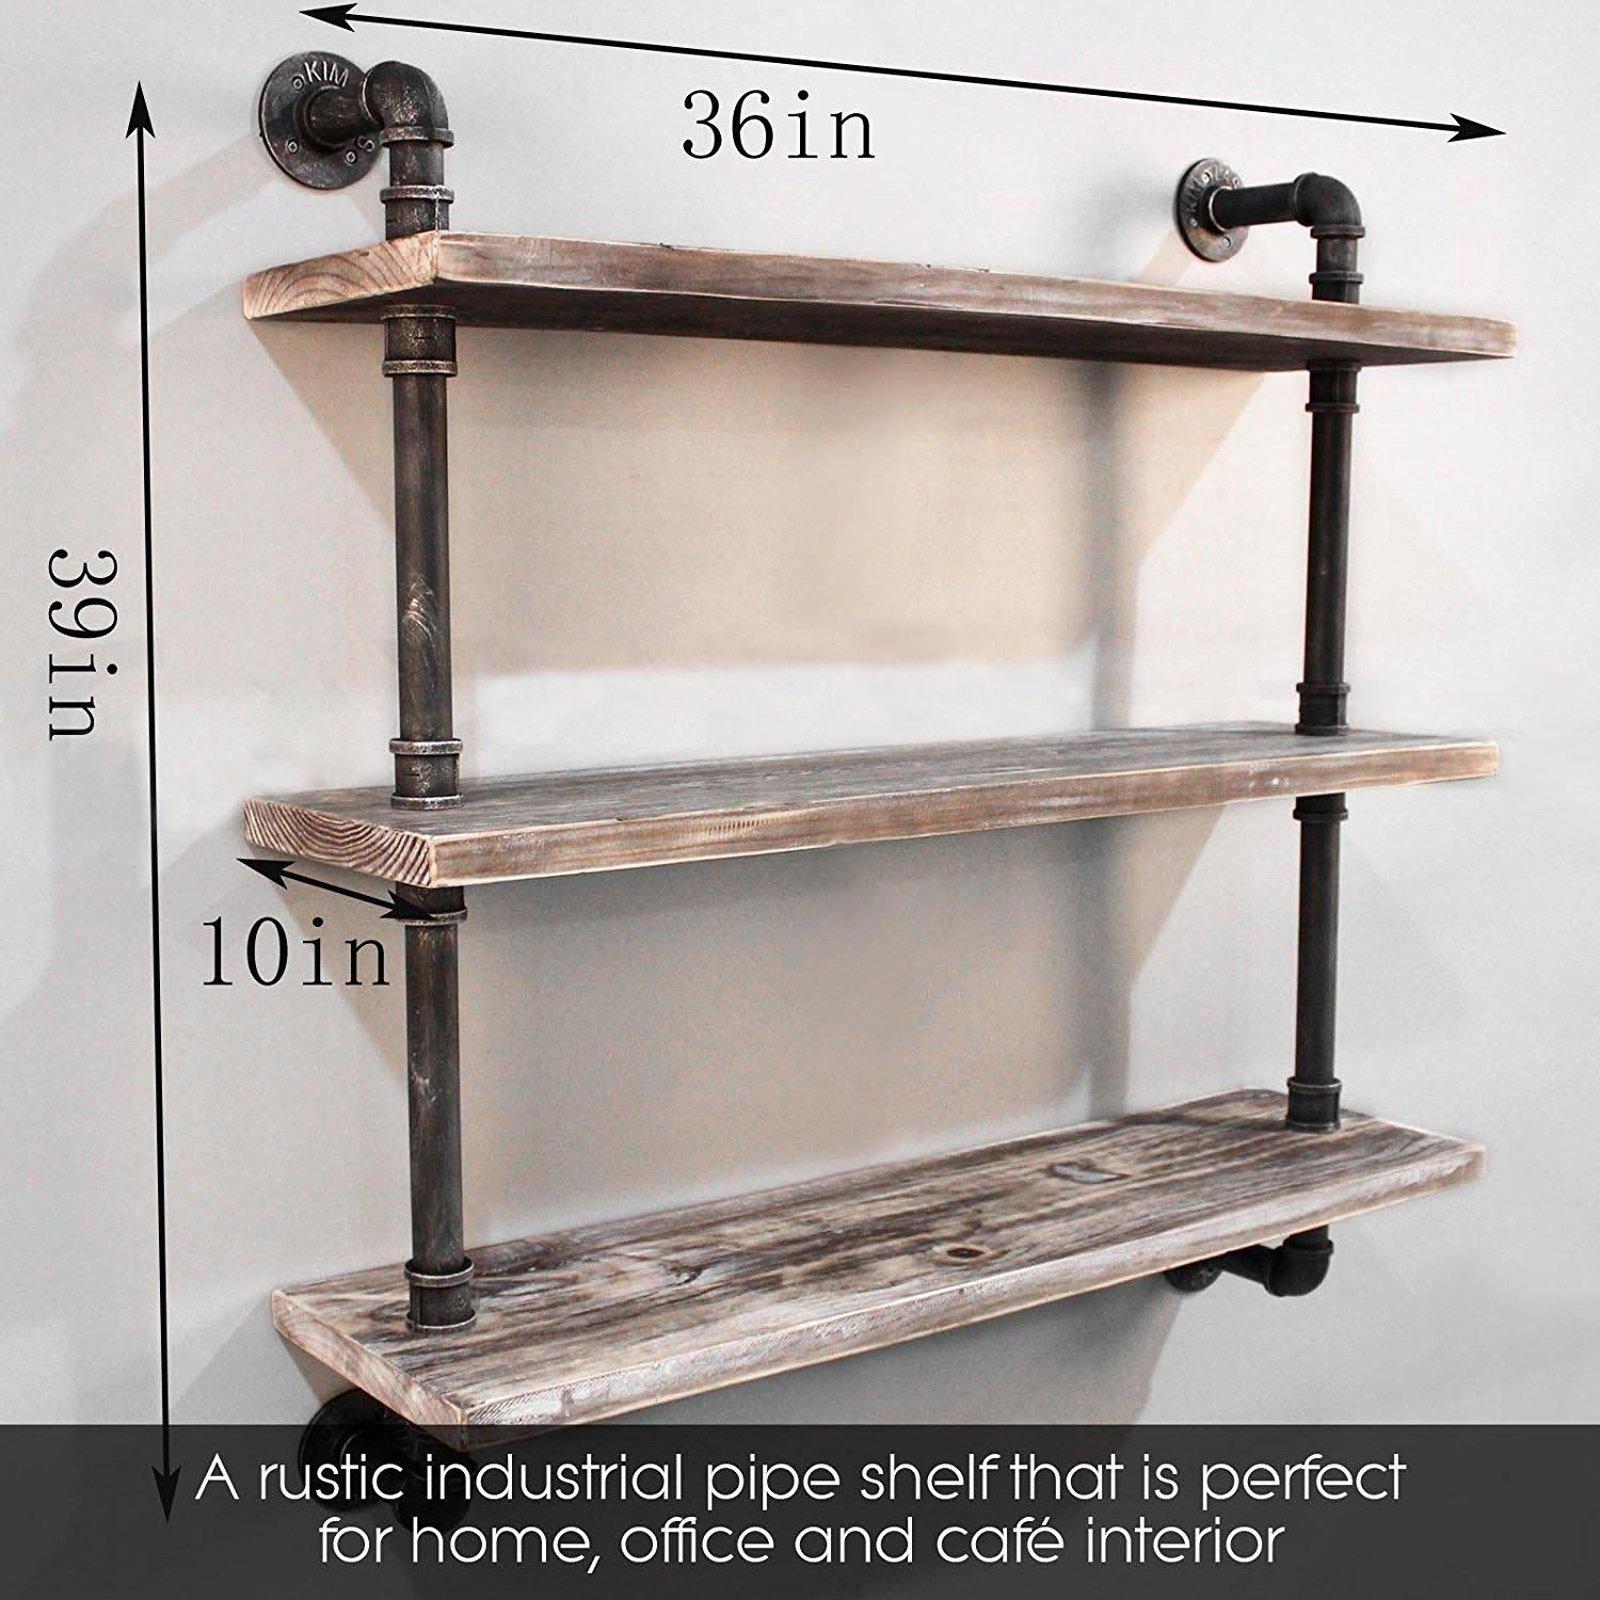 Diwhy Industrial Pipe Shelving Bookshelf Rustic Modern